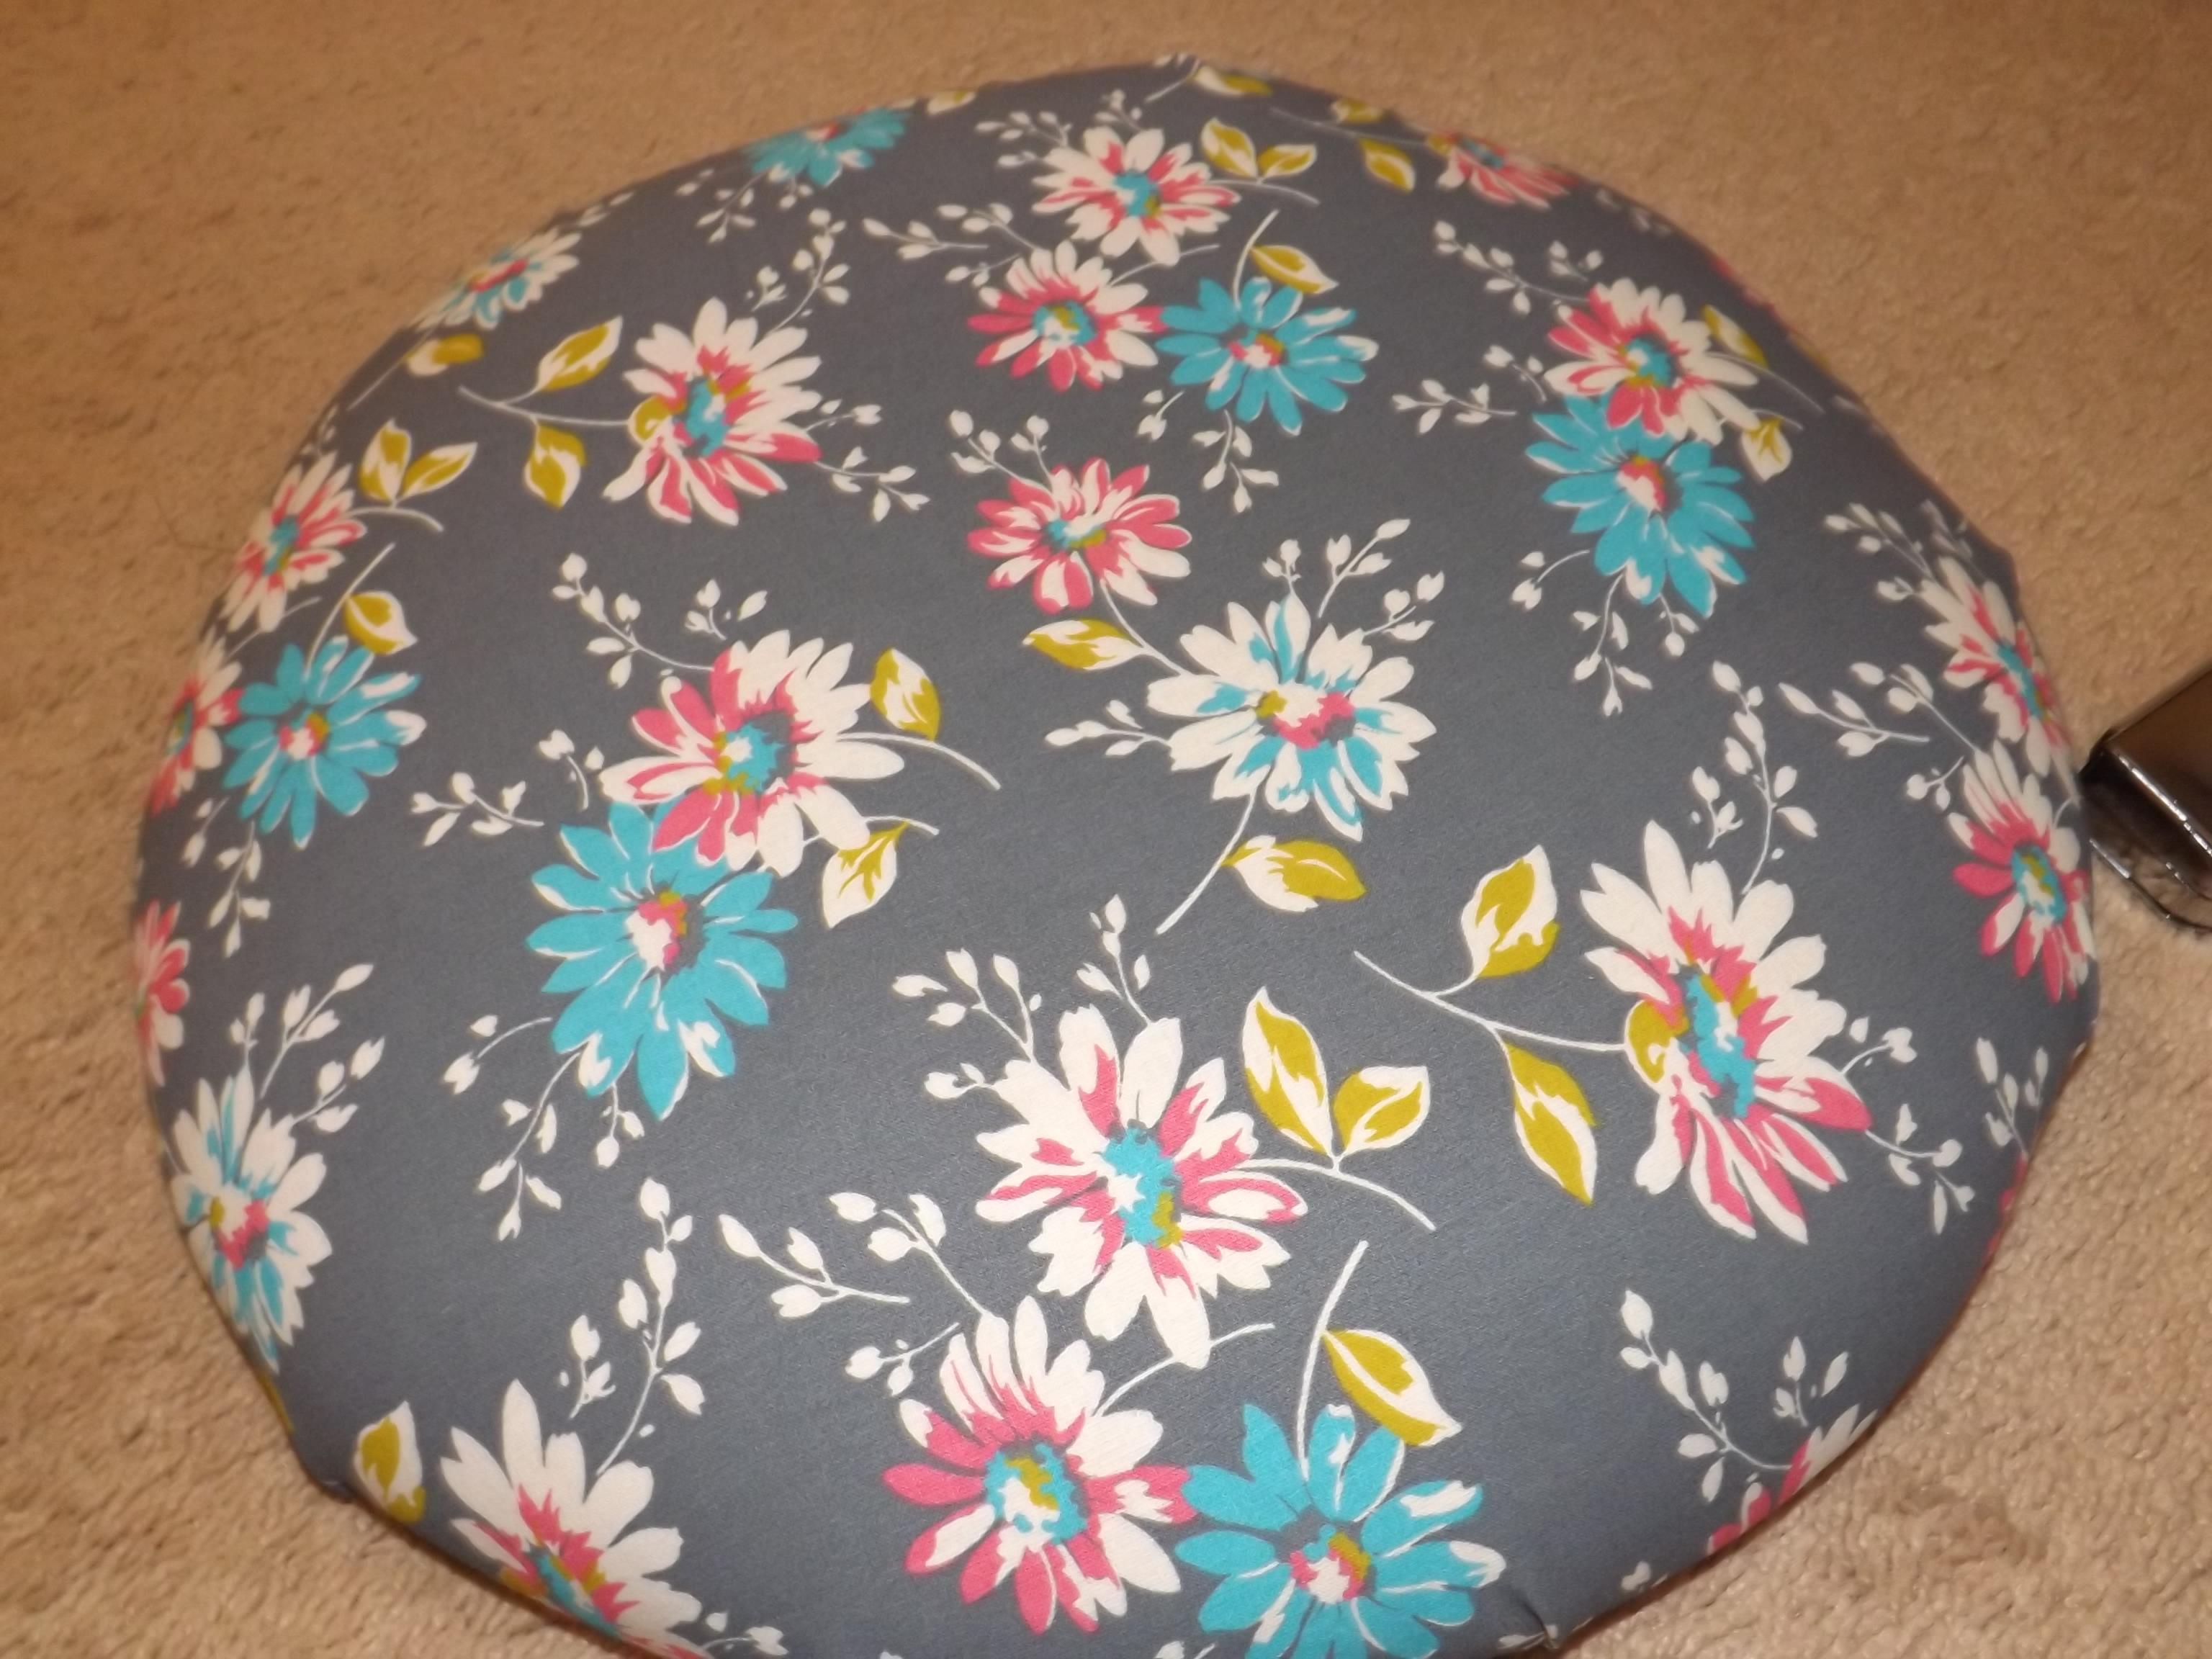 new fabric on cushion